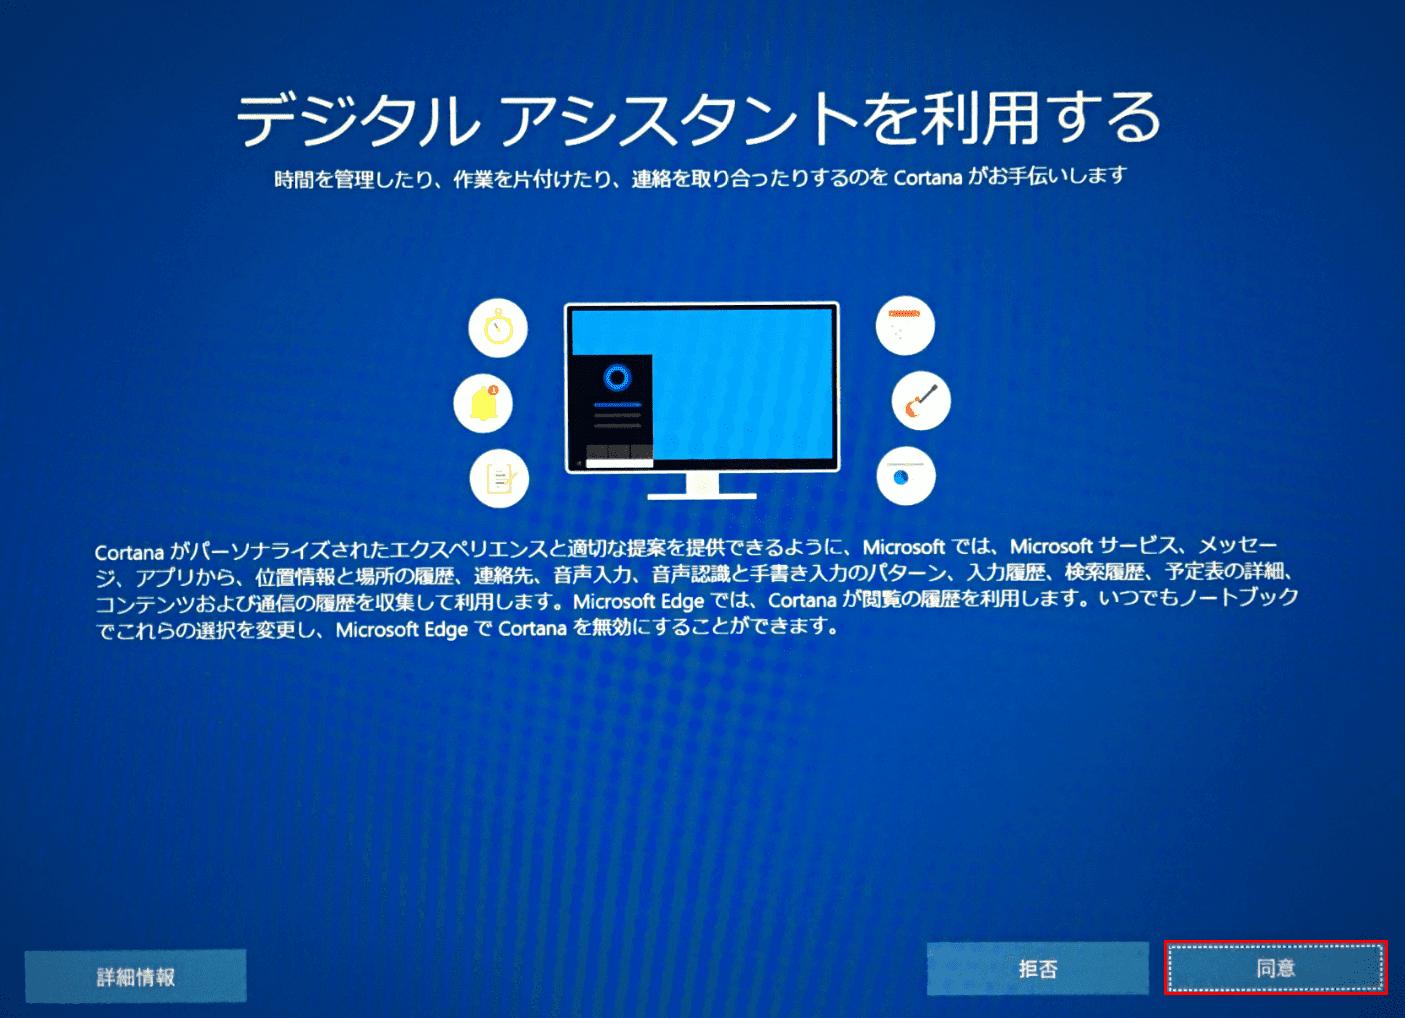 Windows10初期設定、Cortana使用の同意